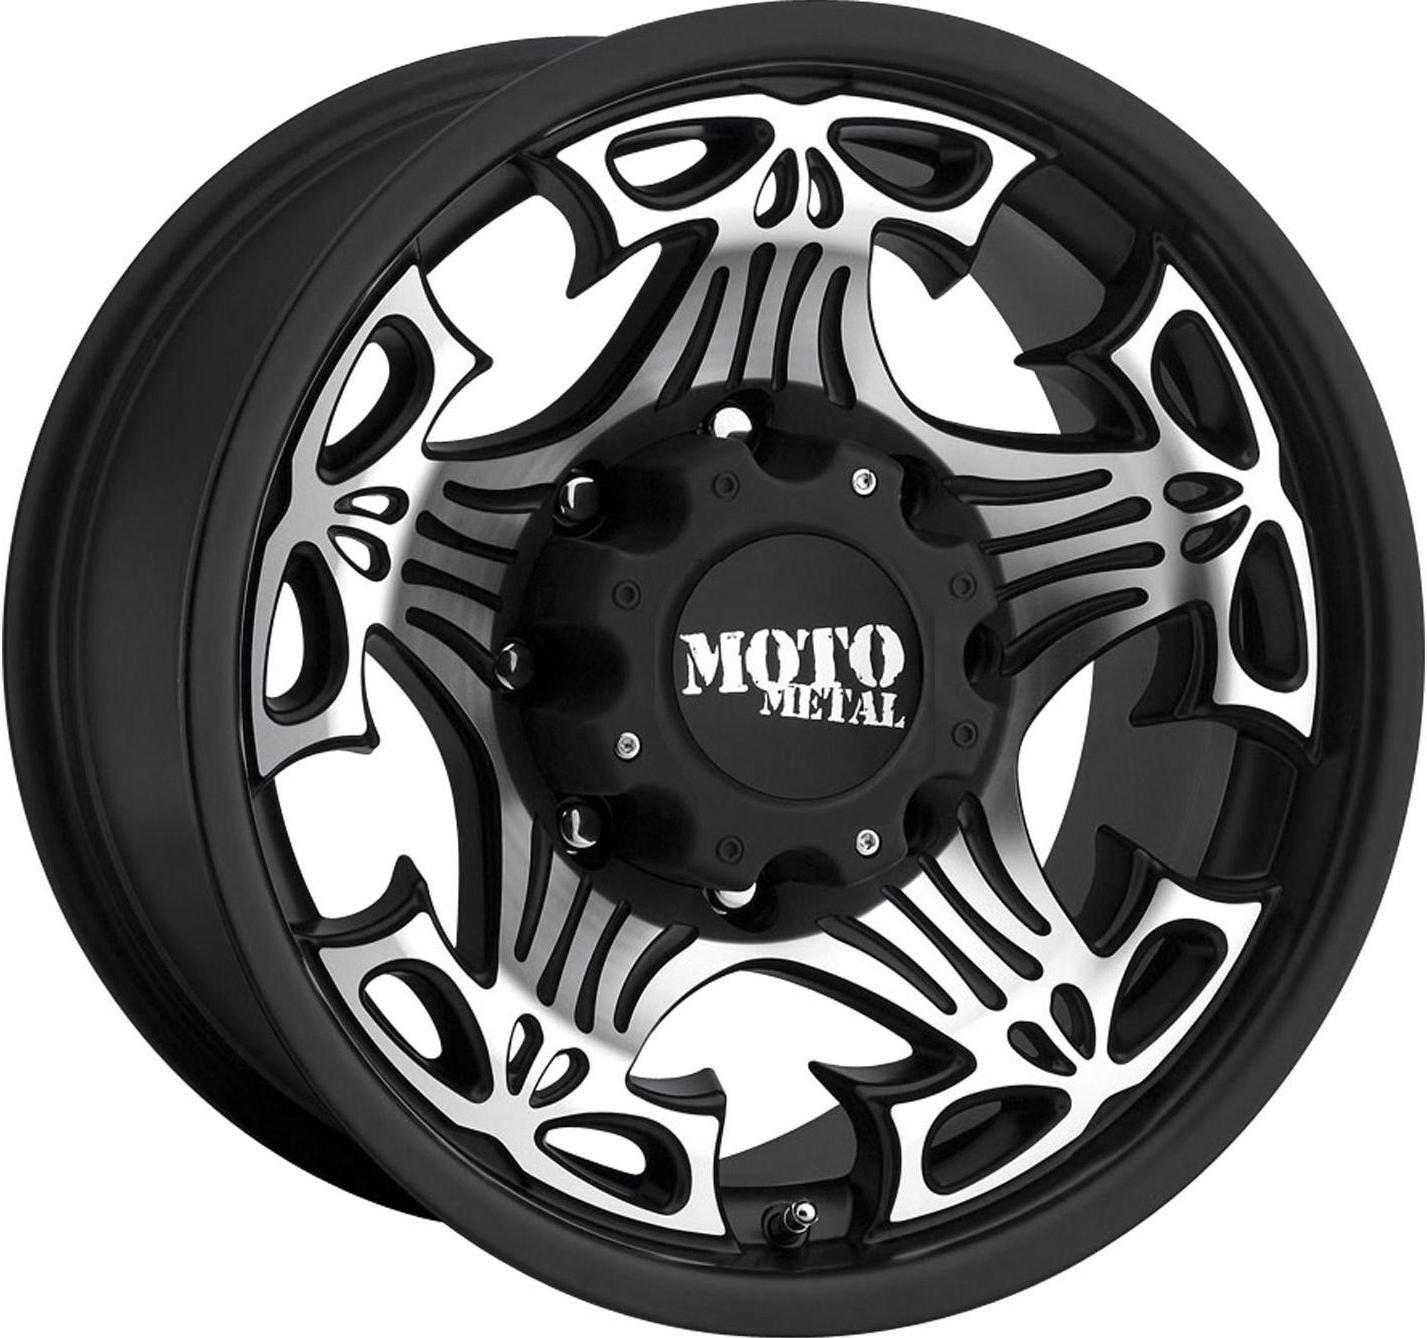 18x9 Moto Metal Black Skull Wheels Rims Jeep Wrangler JK Rubicon 4x4